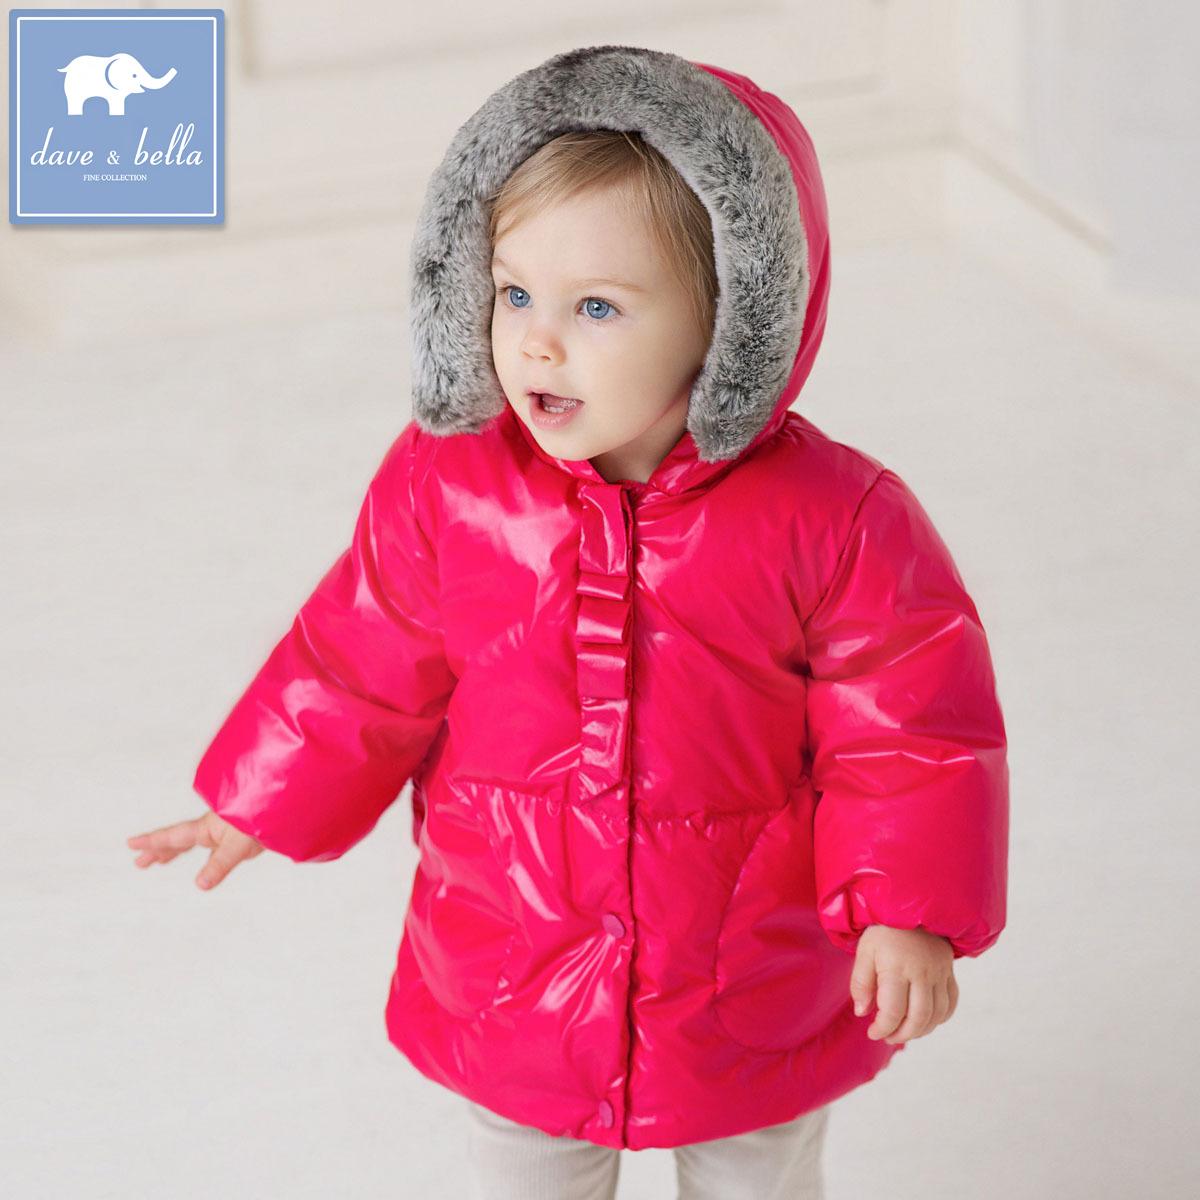 Girl baby autumn and winter snowsuit baby-snowsuit jackets infant children's winter